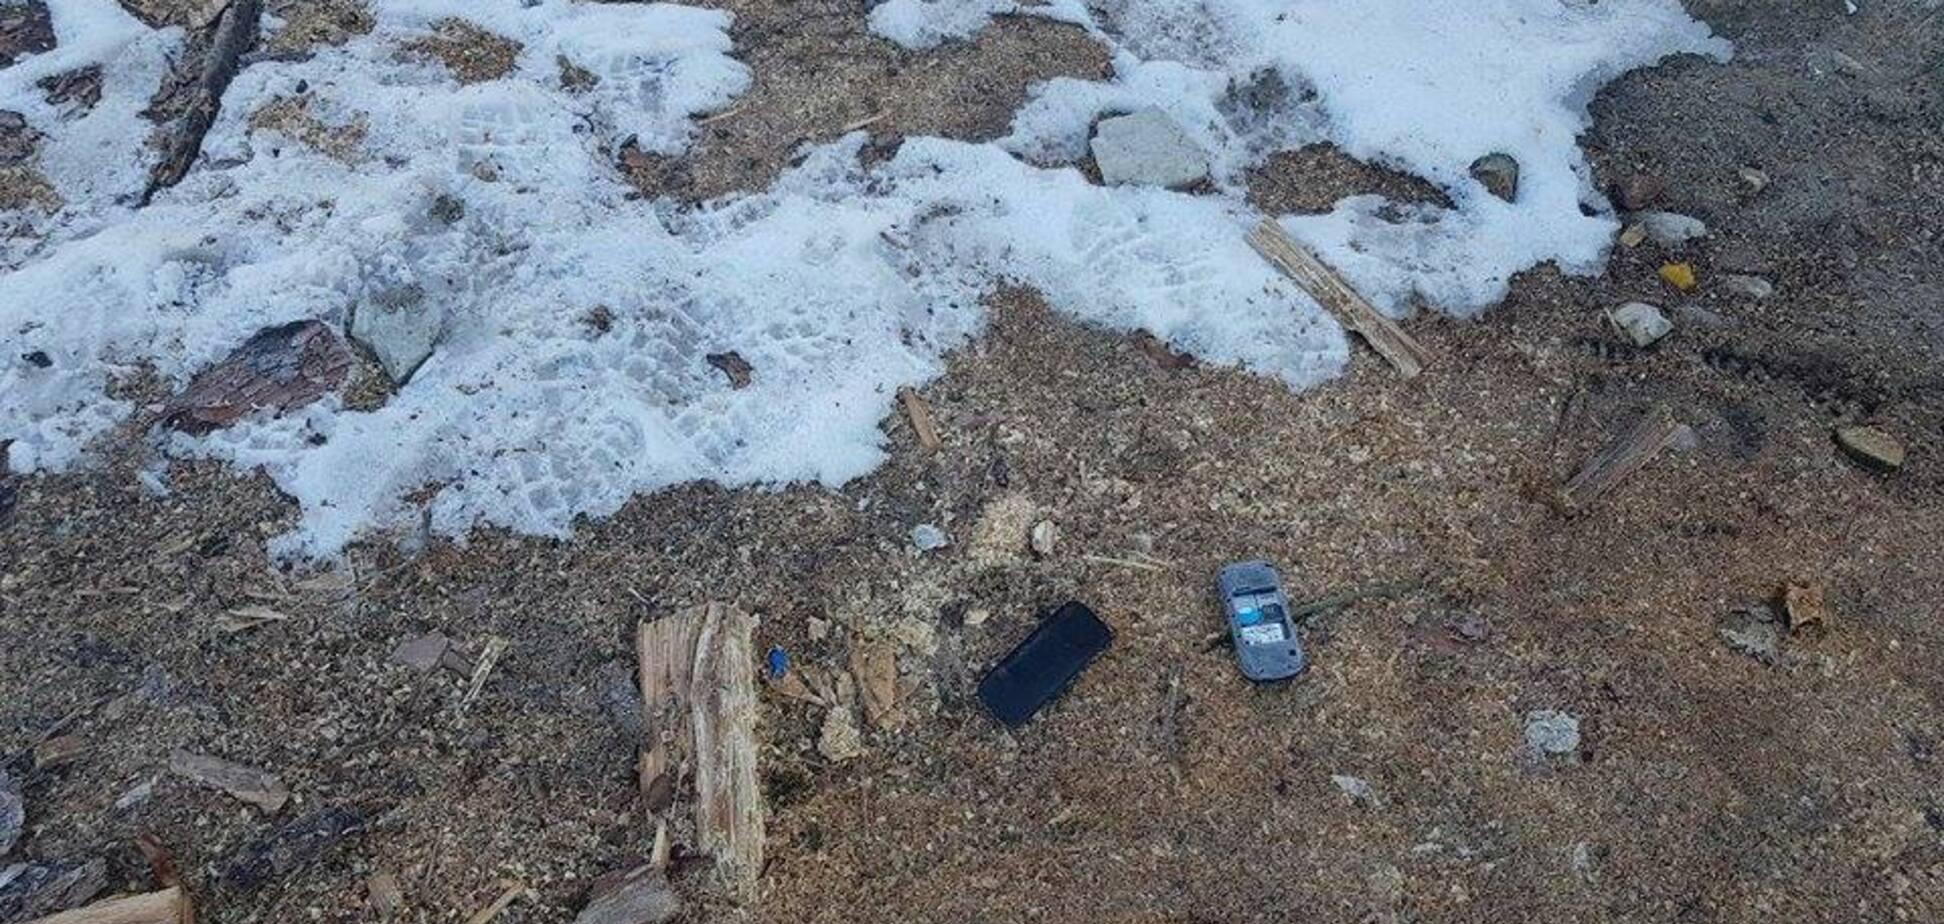 В Киеве зверски убили активиста: появились фото с места ЧП. 18+